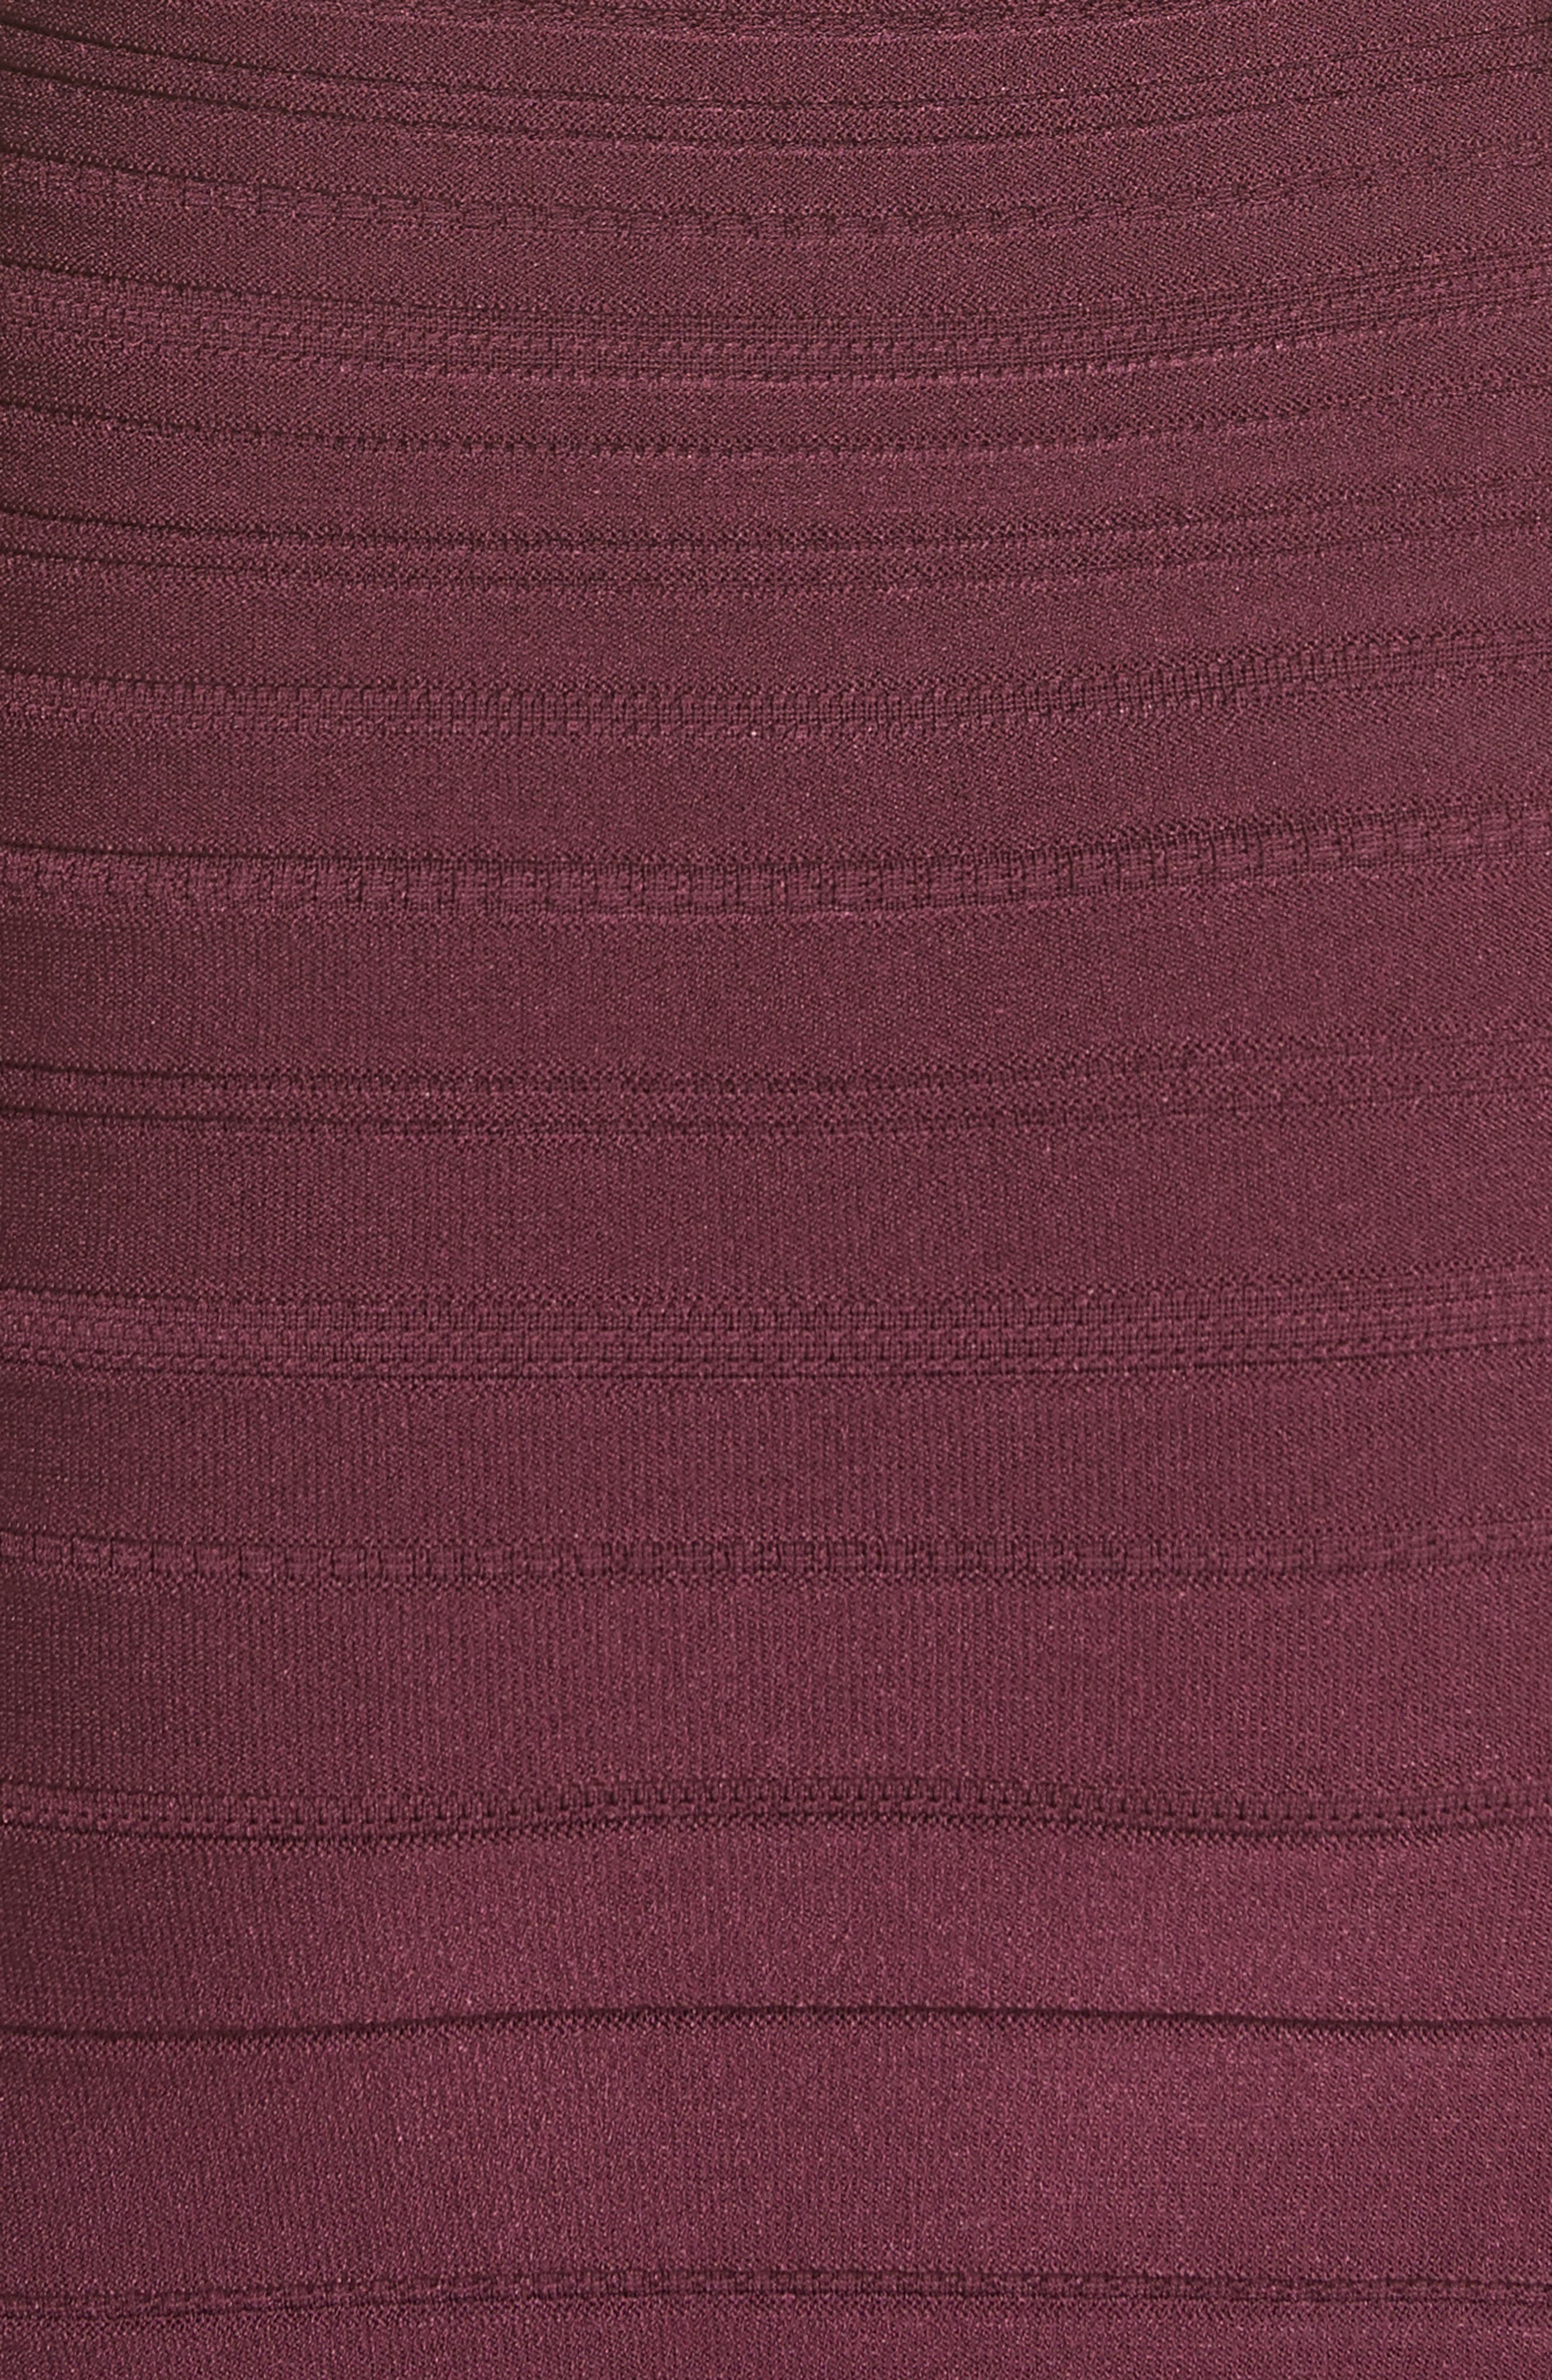 Knit High Neck Dress,                             Alternate thumbnail 5, color,                             540